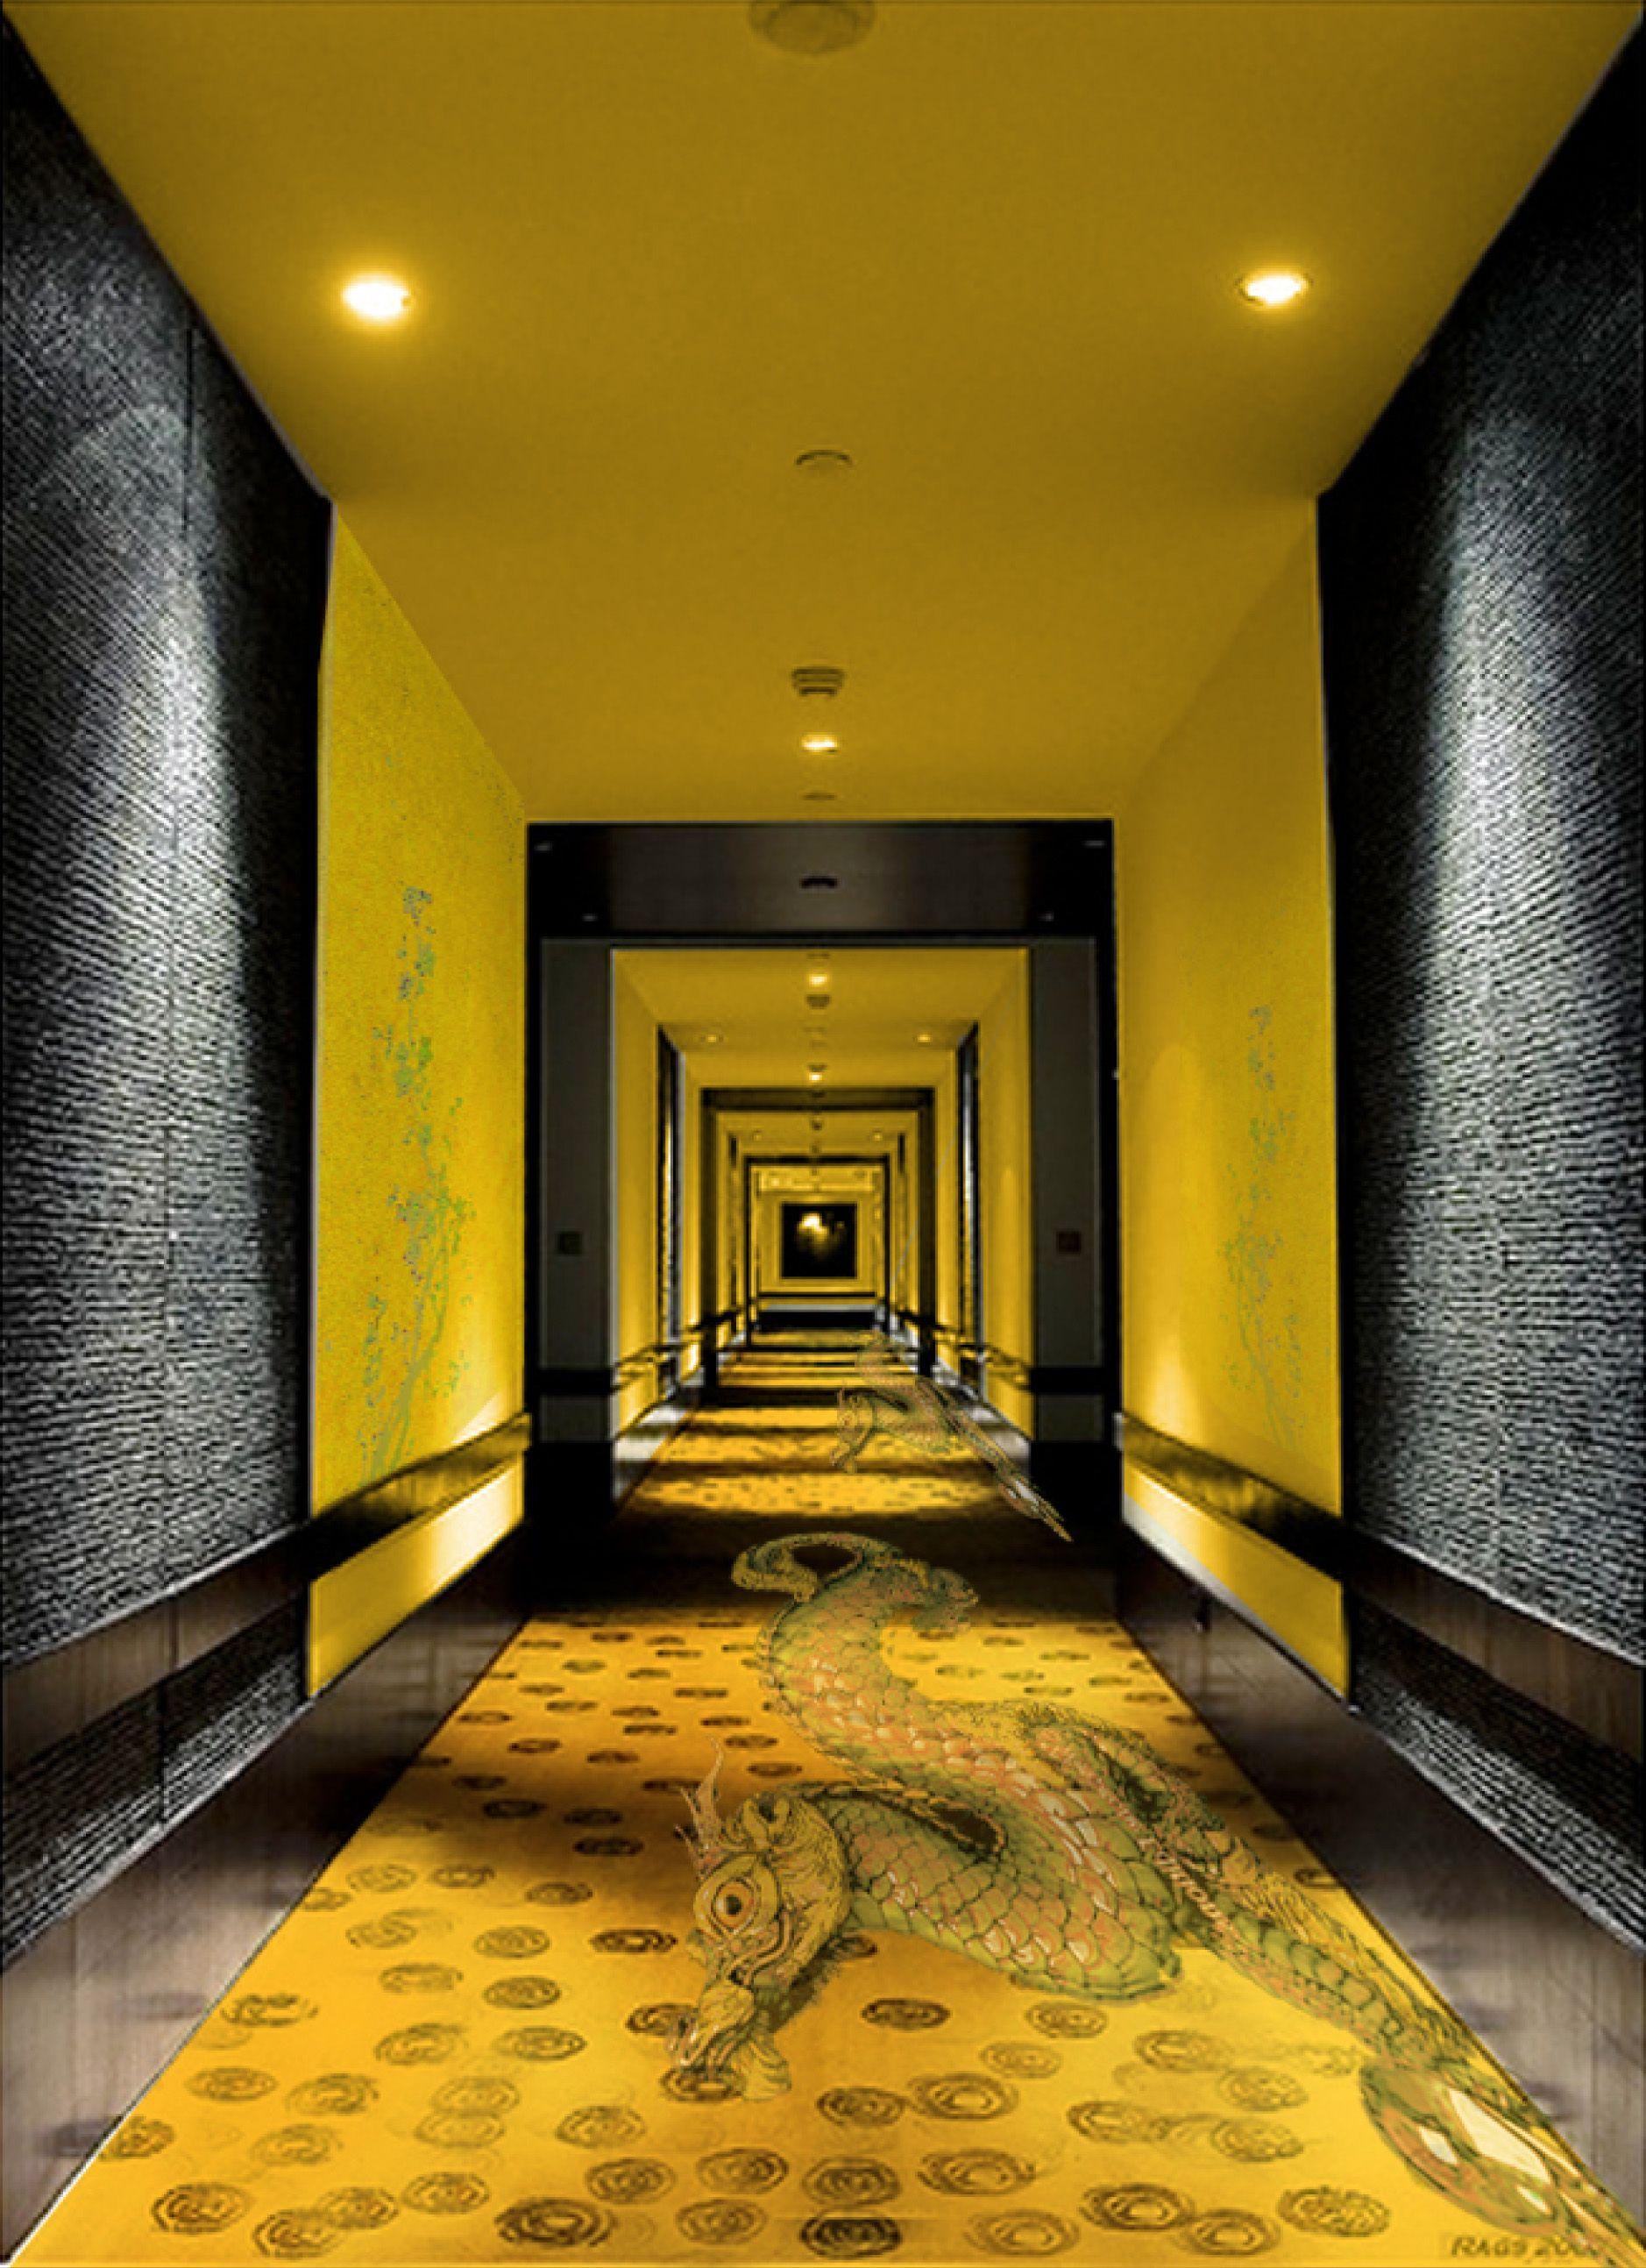 hotel hallway lighting. Hotel Hallway . Lighting